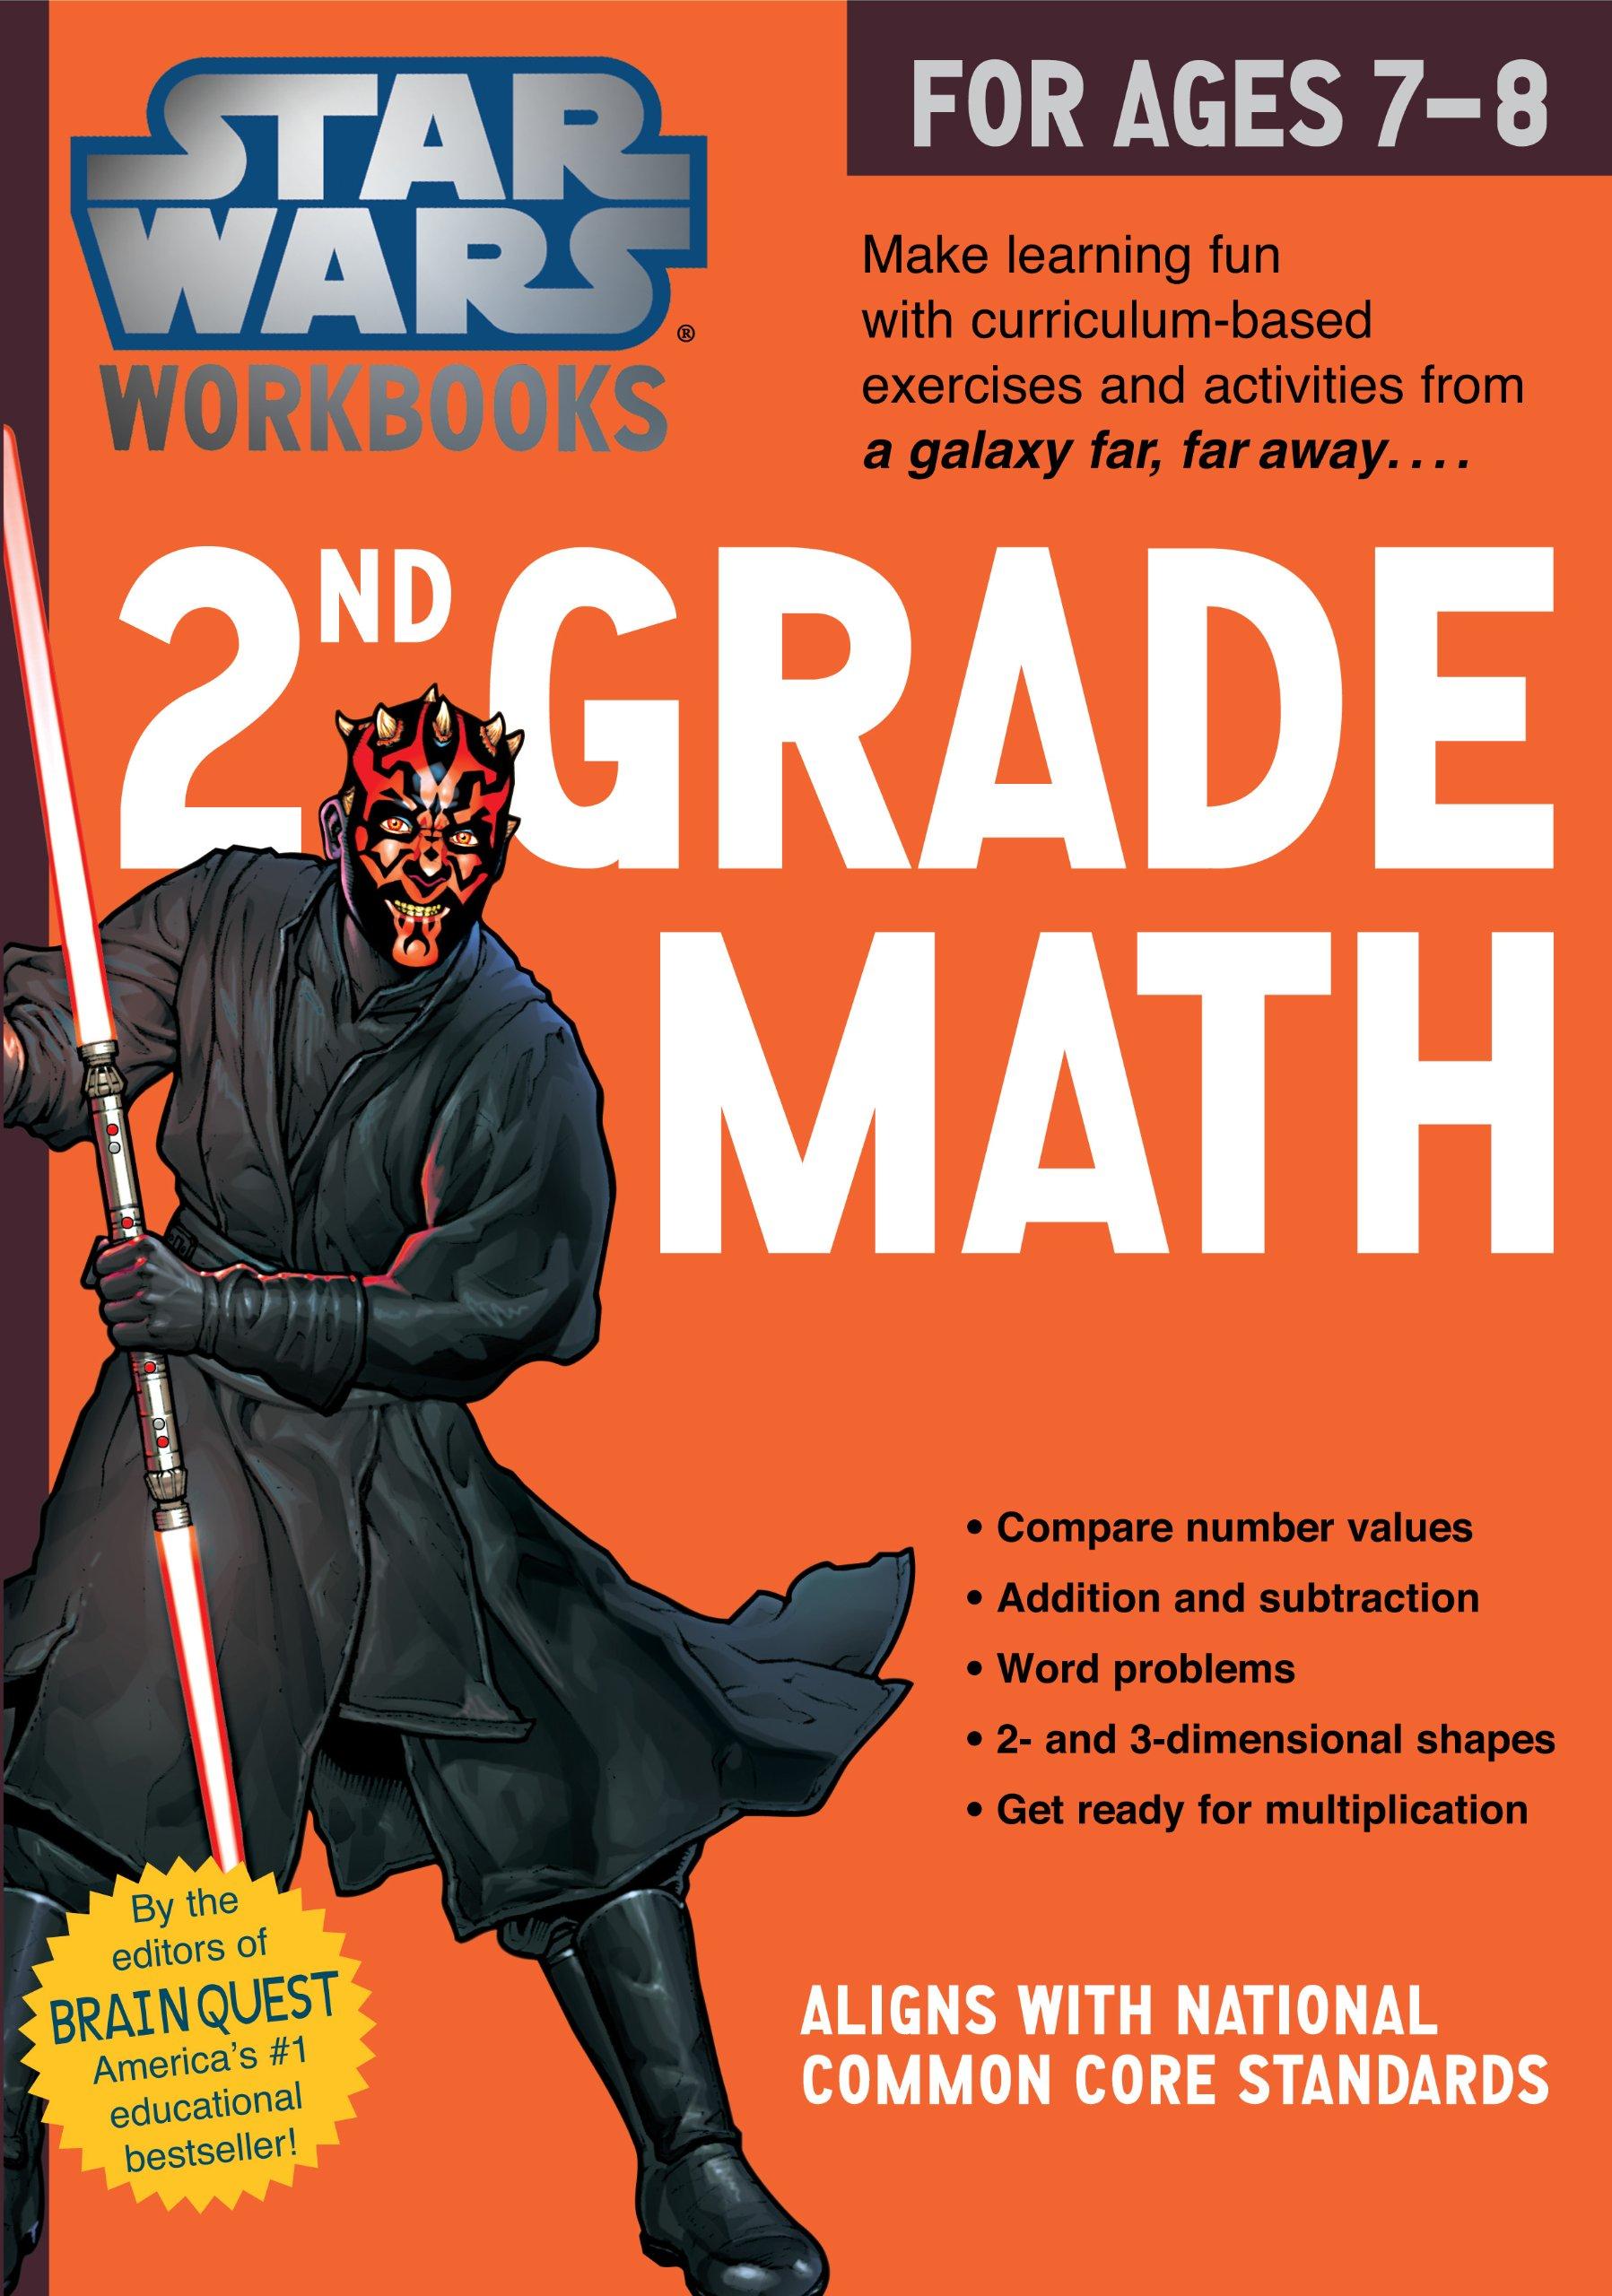 math worksheet : mega list of over 100 free star wars printables crafts and  : Star Wars Math Worksheets